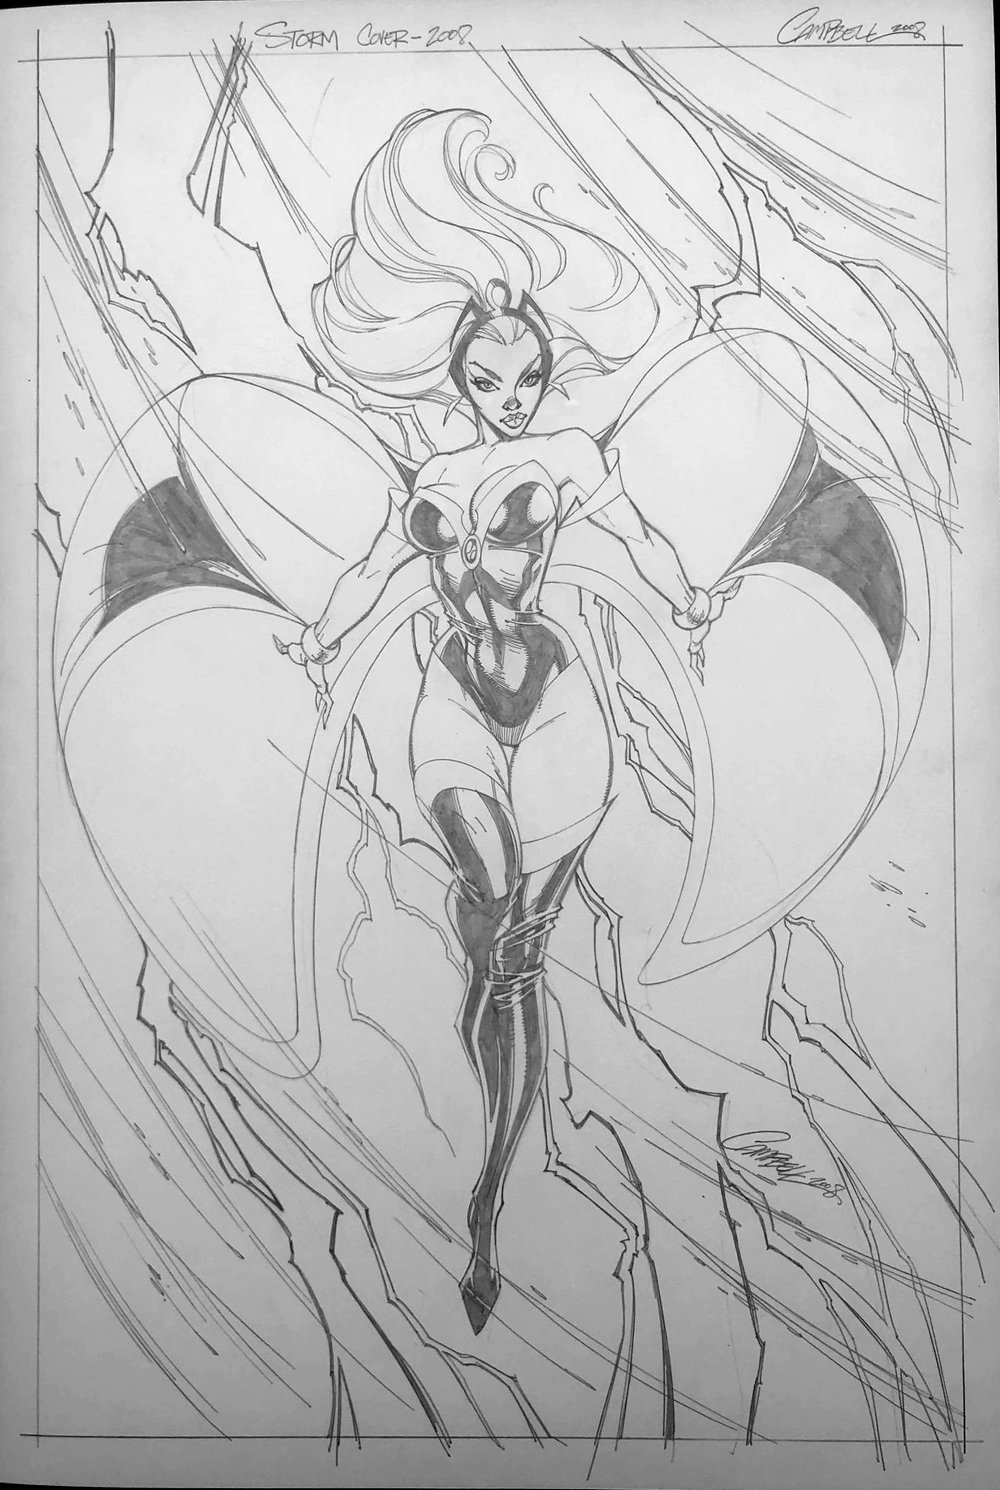 X-Men Worlds Apart #1 Cover (2008)